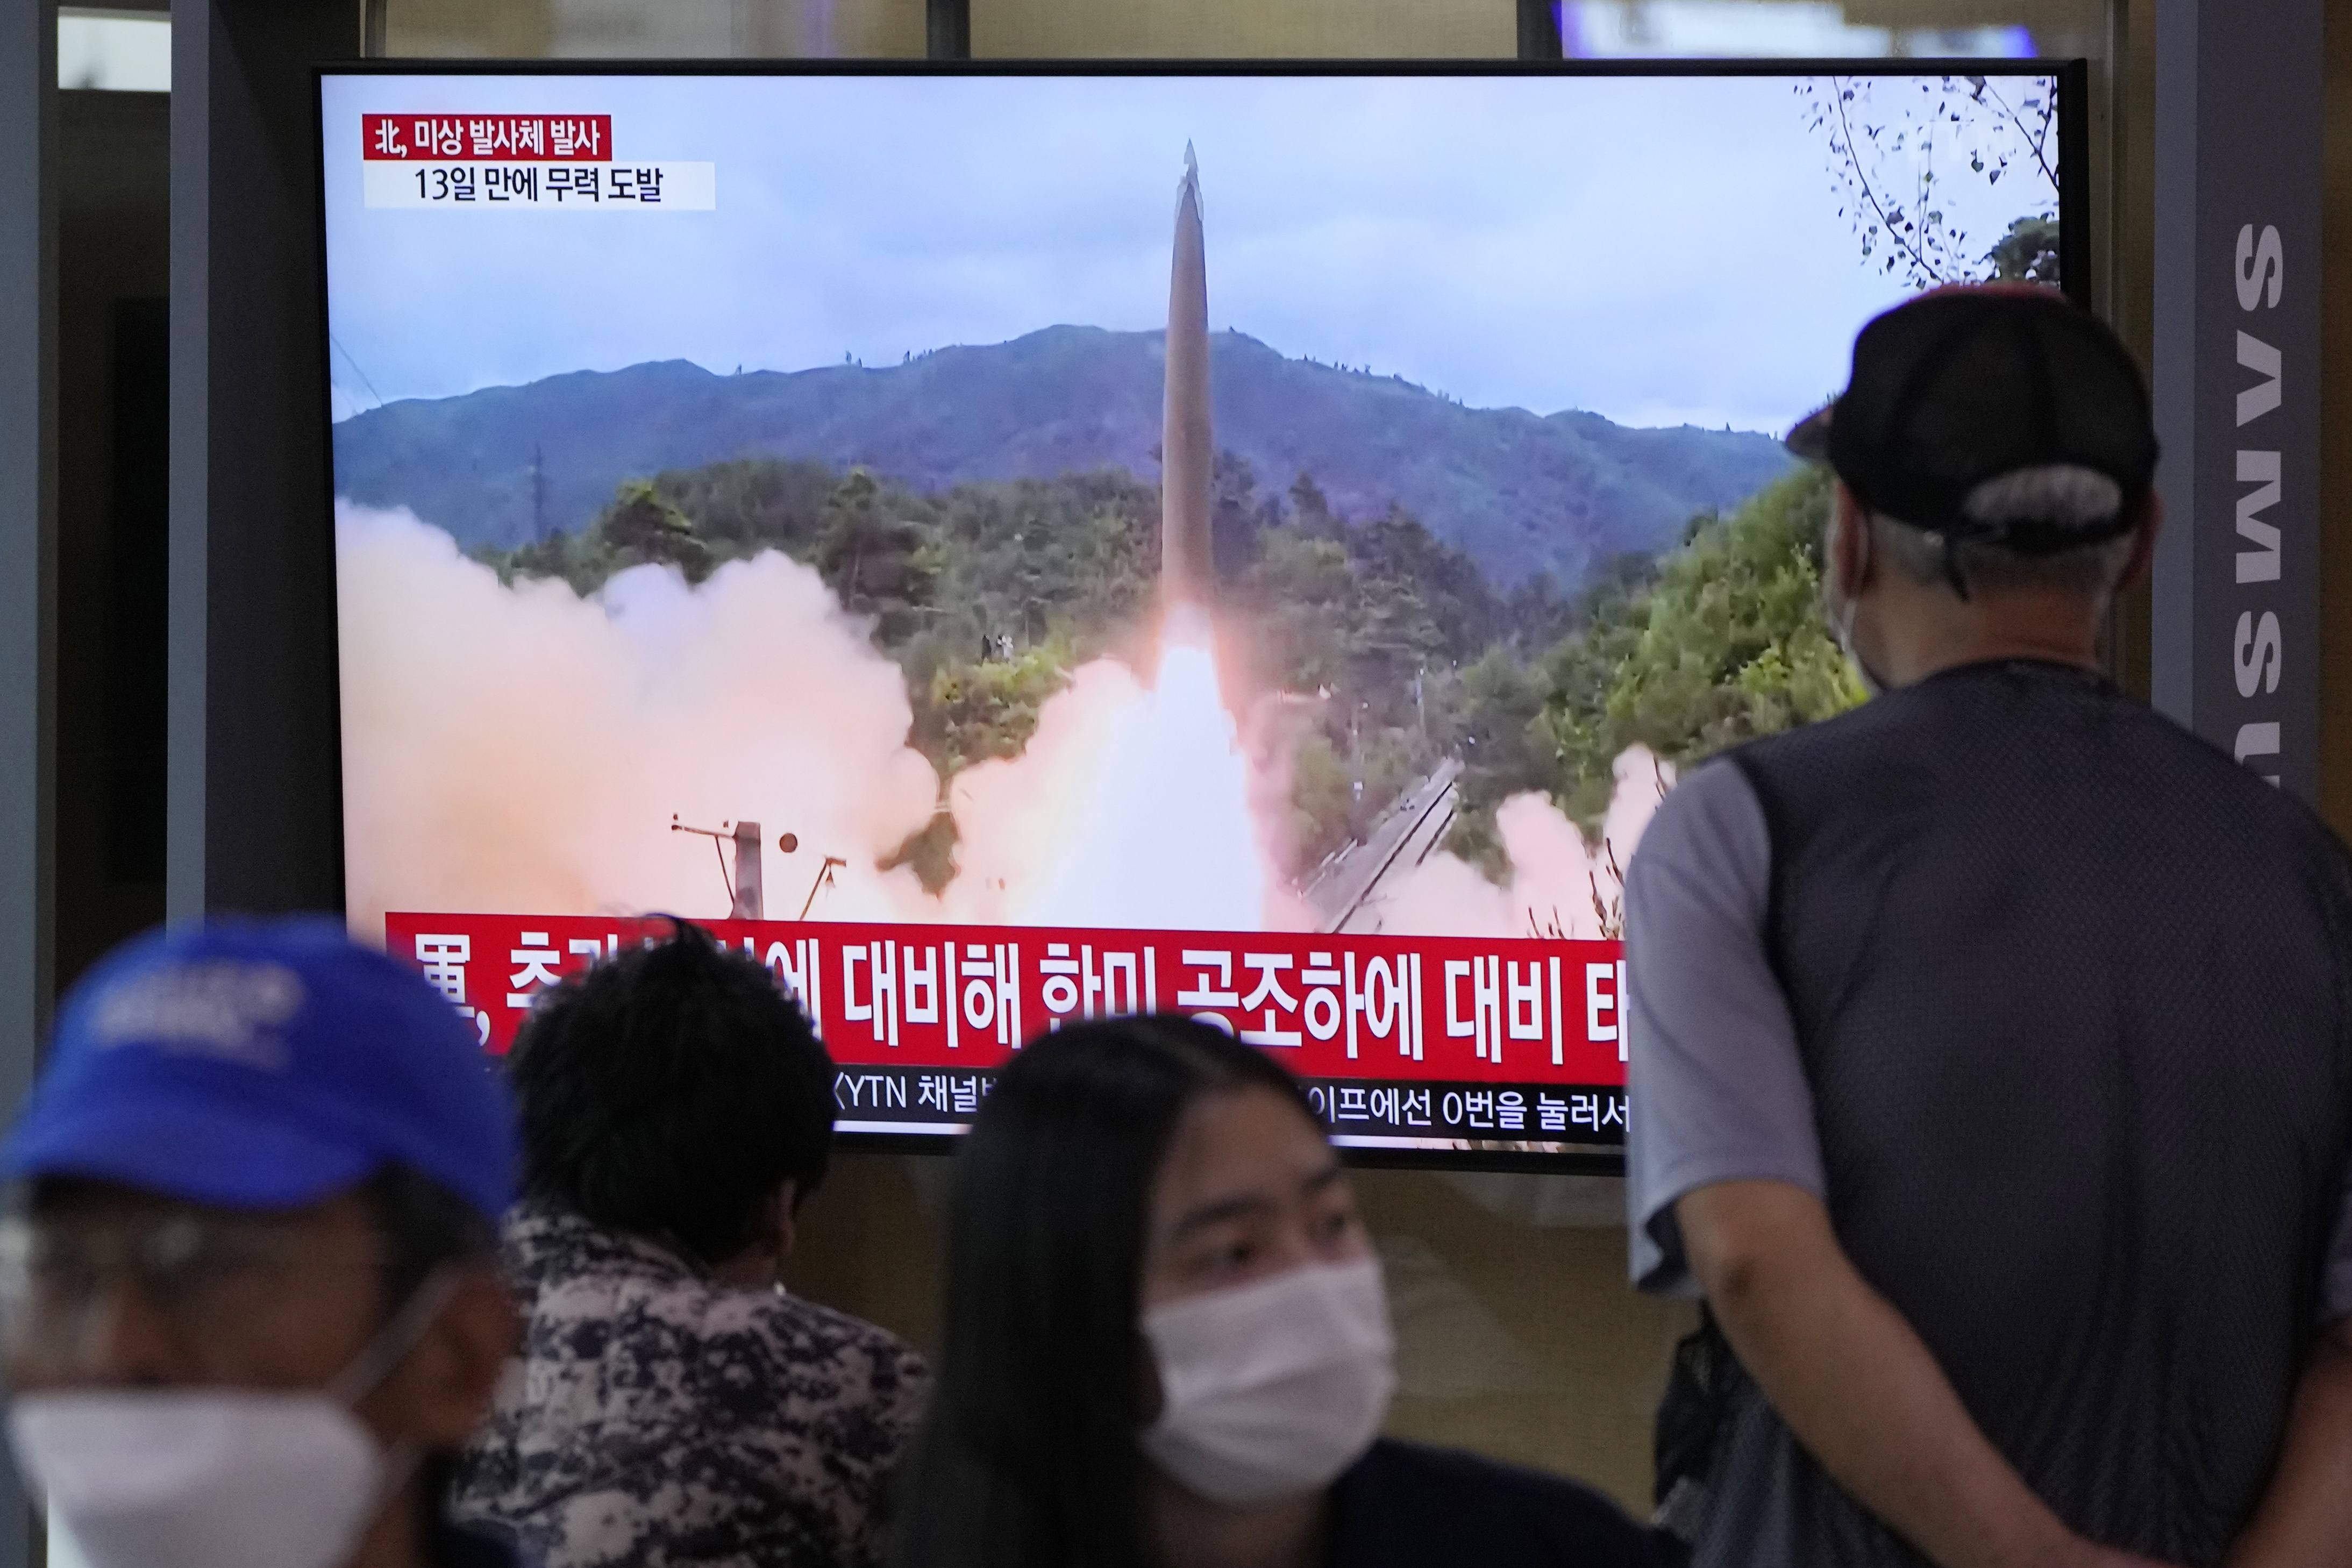 North Korea fires unidentified projectile as U.N. envoy criticizes 'hostile' U.S. policy